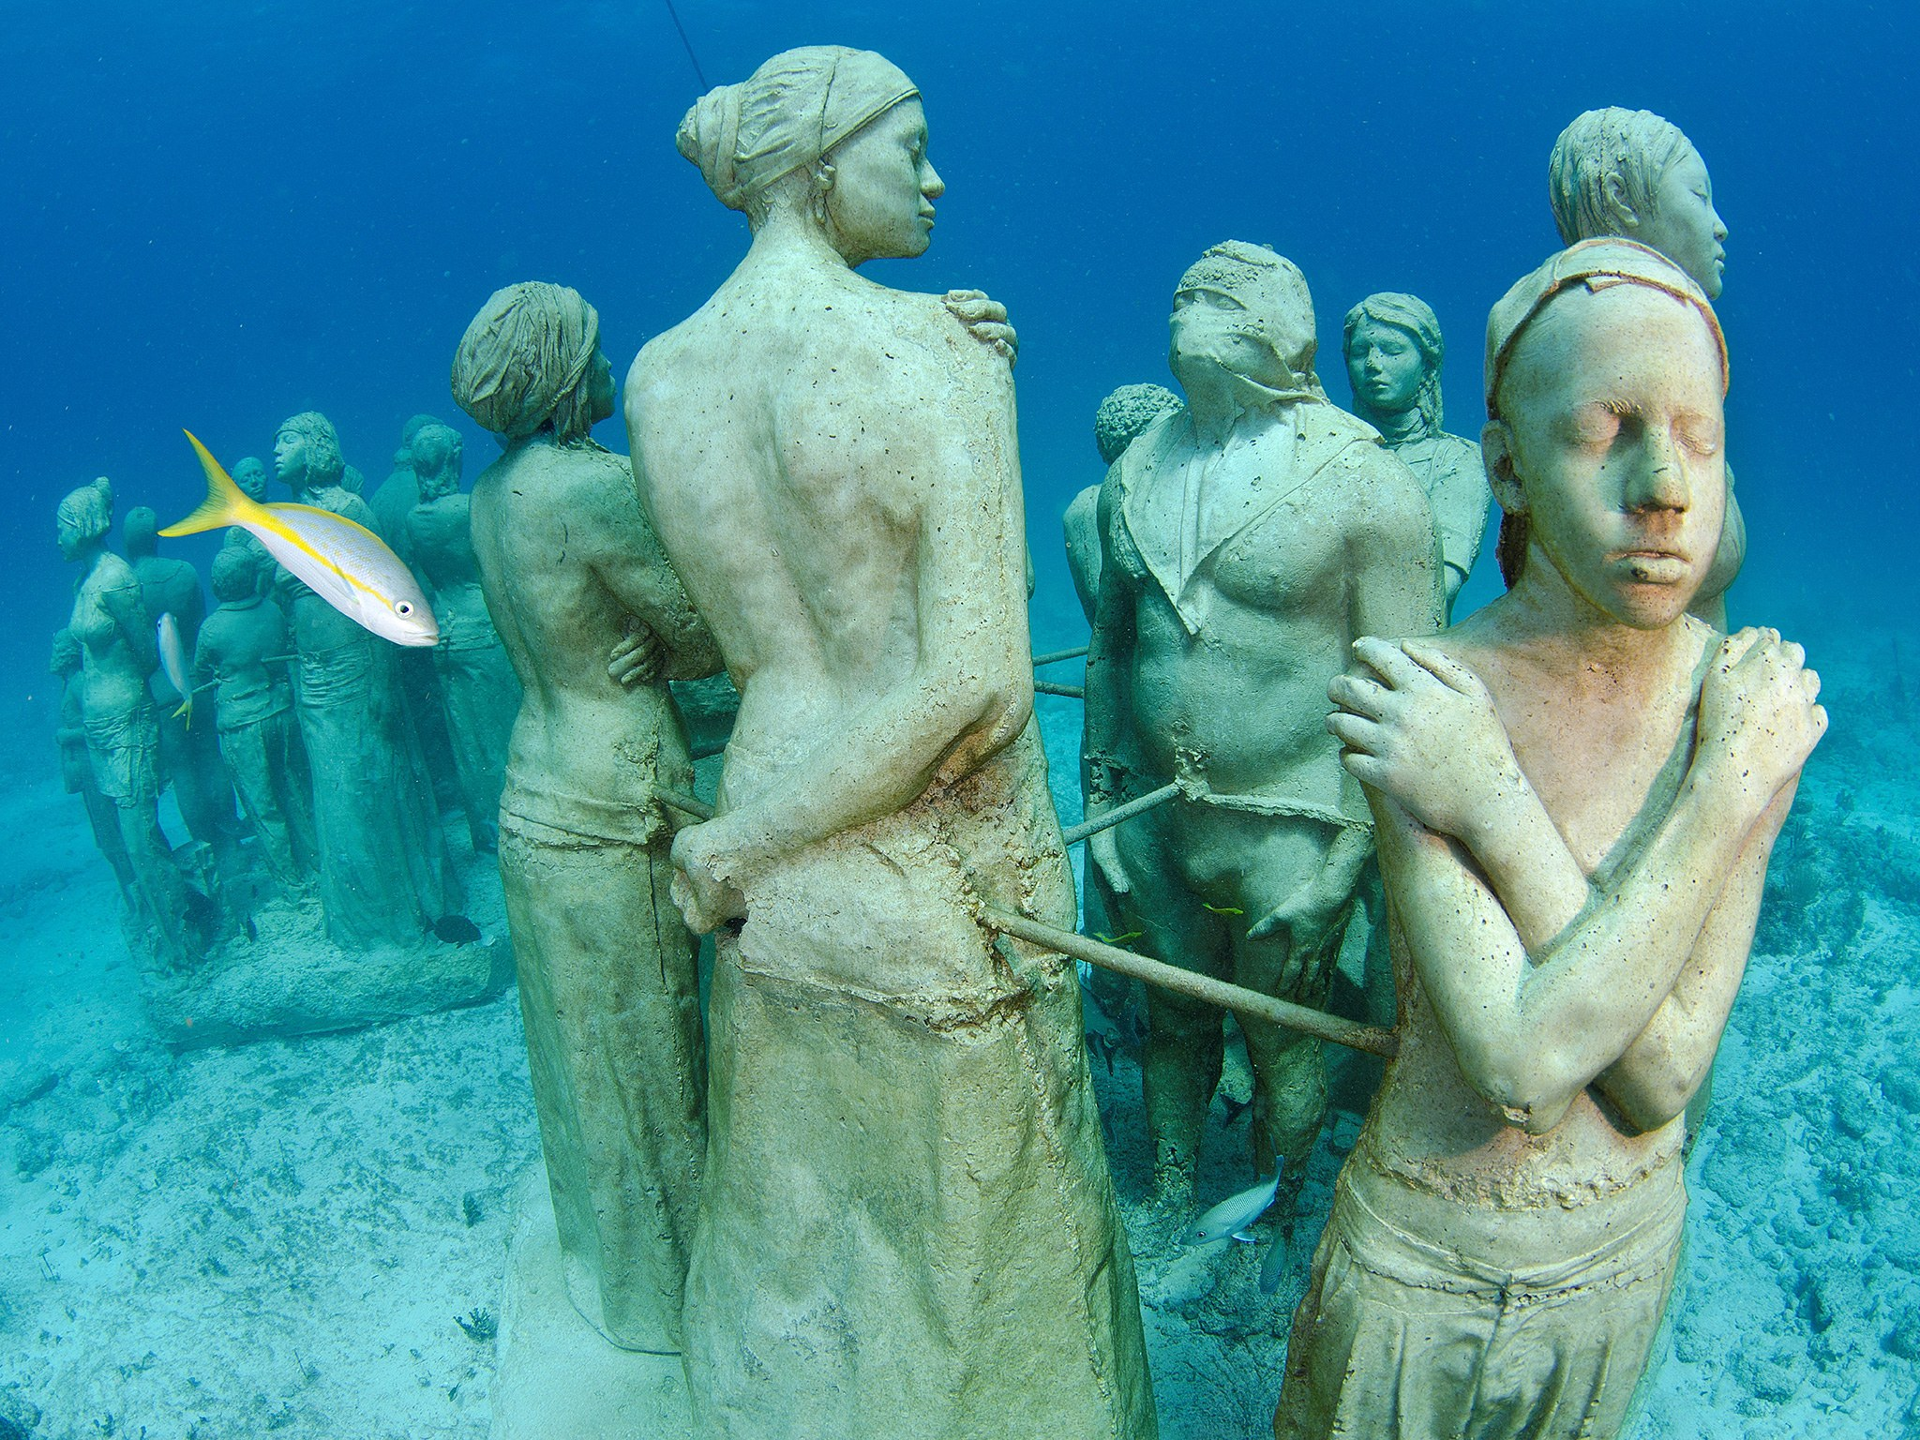 2. Музей подводных скульптур, Канкун, Мексика.